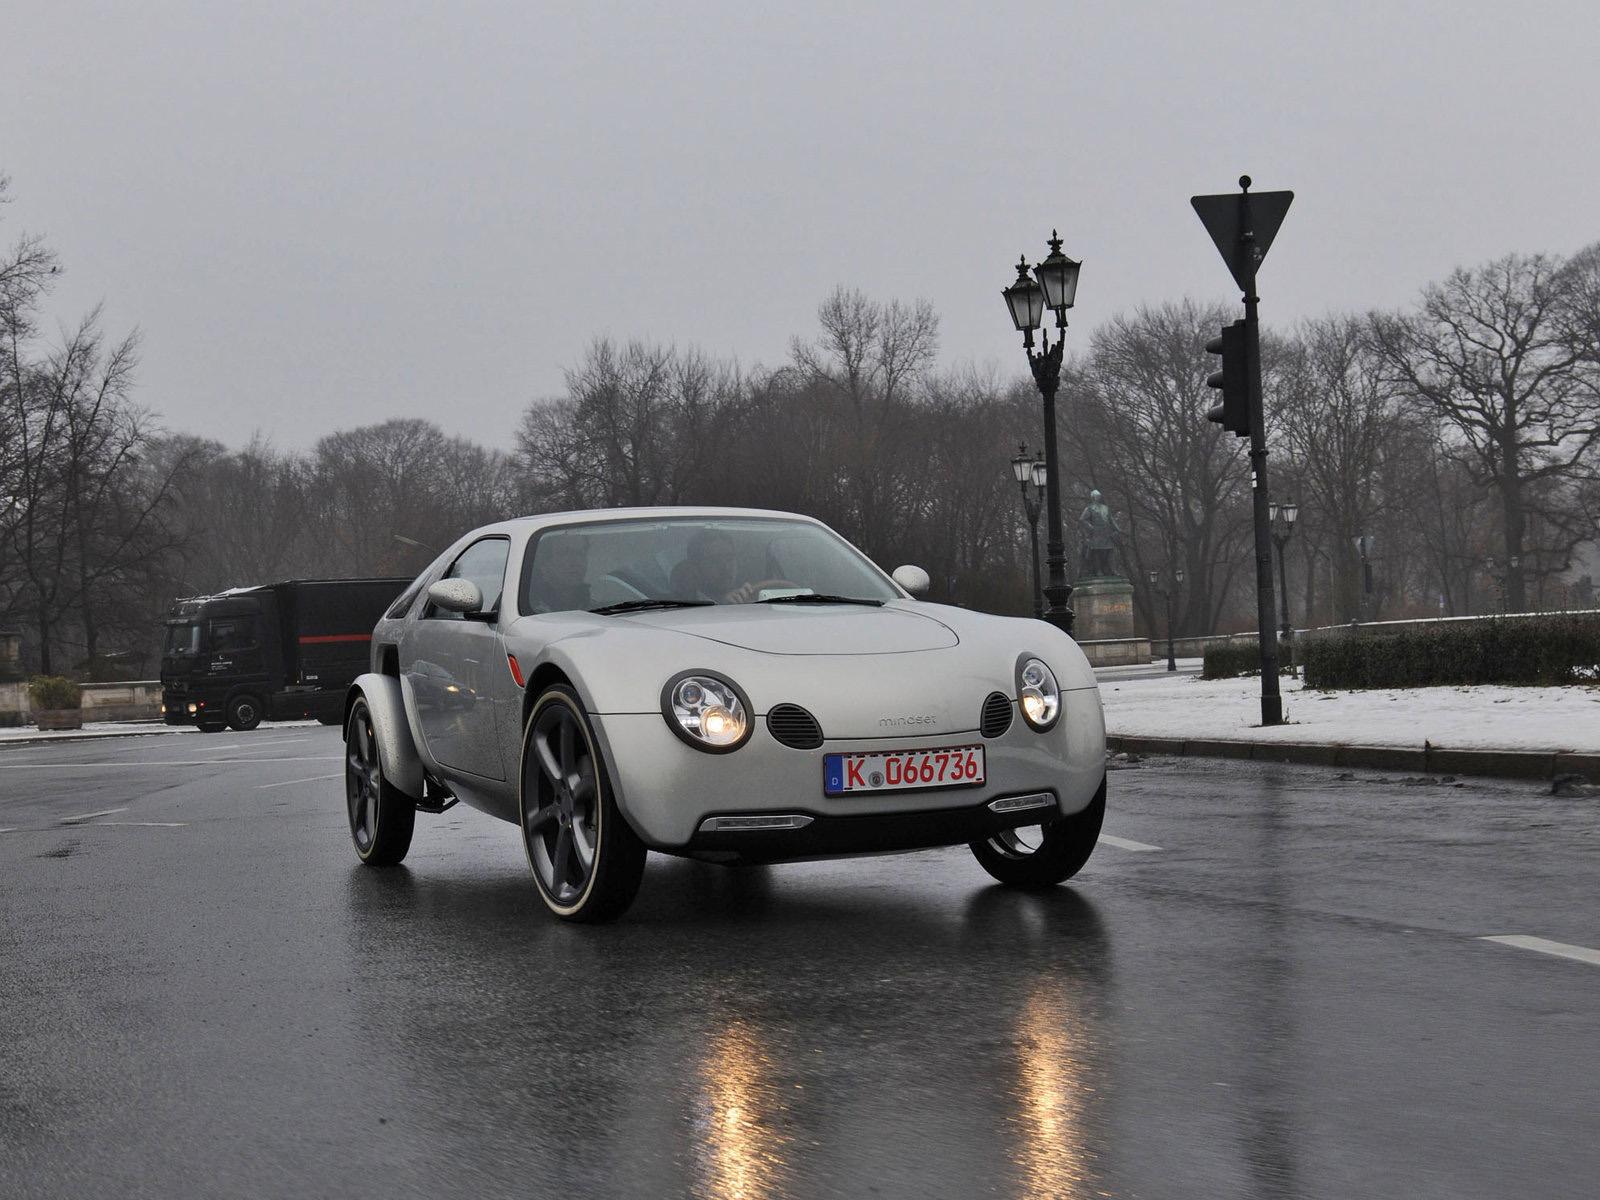 Wallpaper Mobil Sport Tvr Netcarshow Netcar Gambar